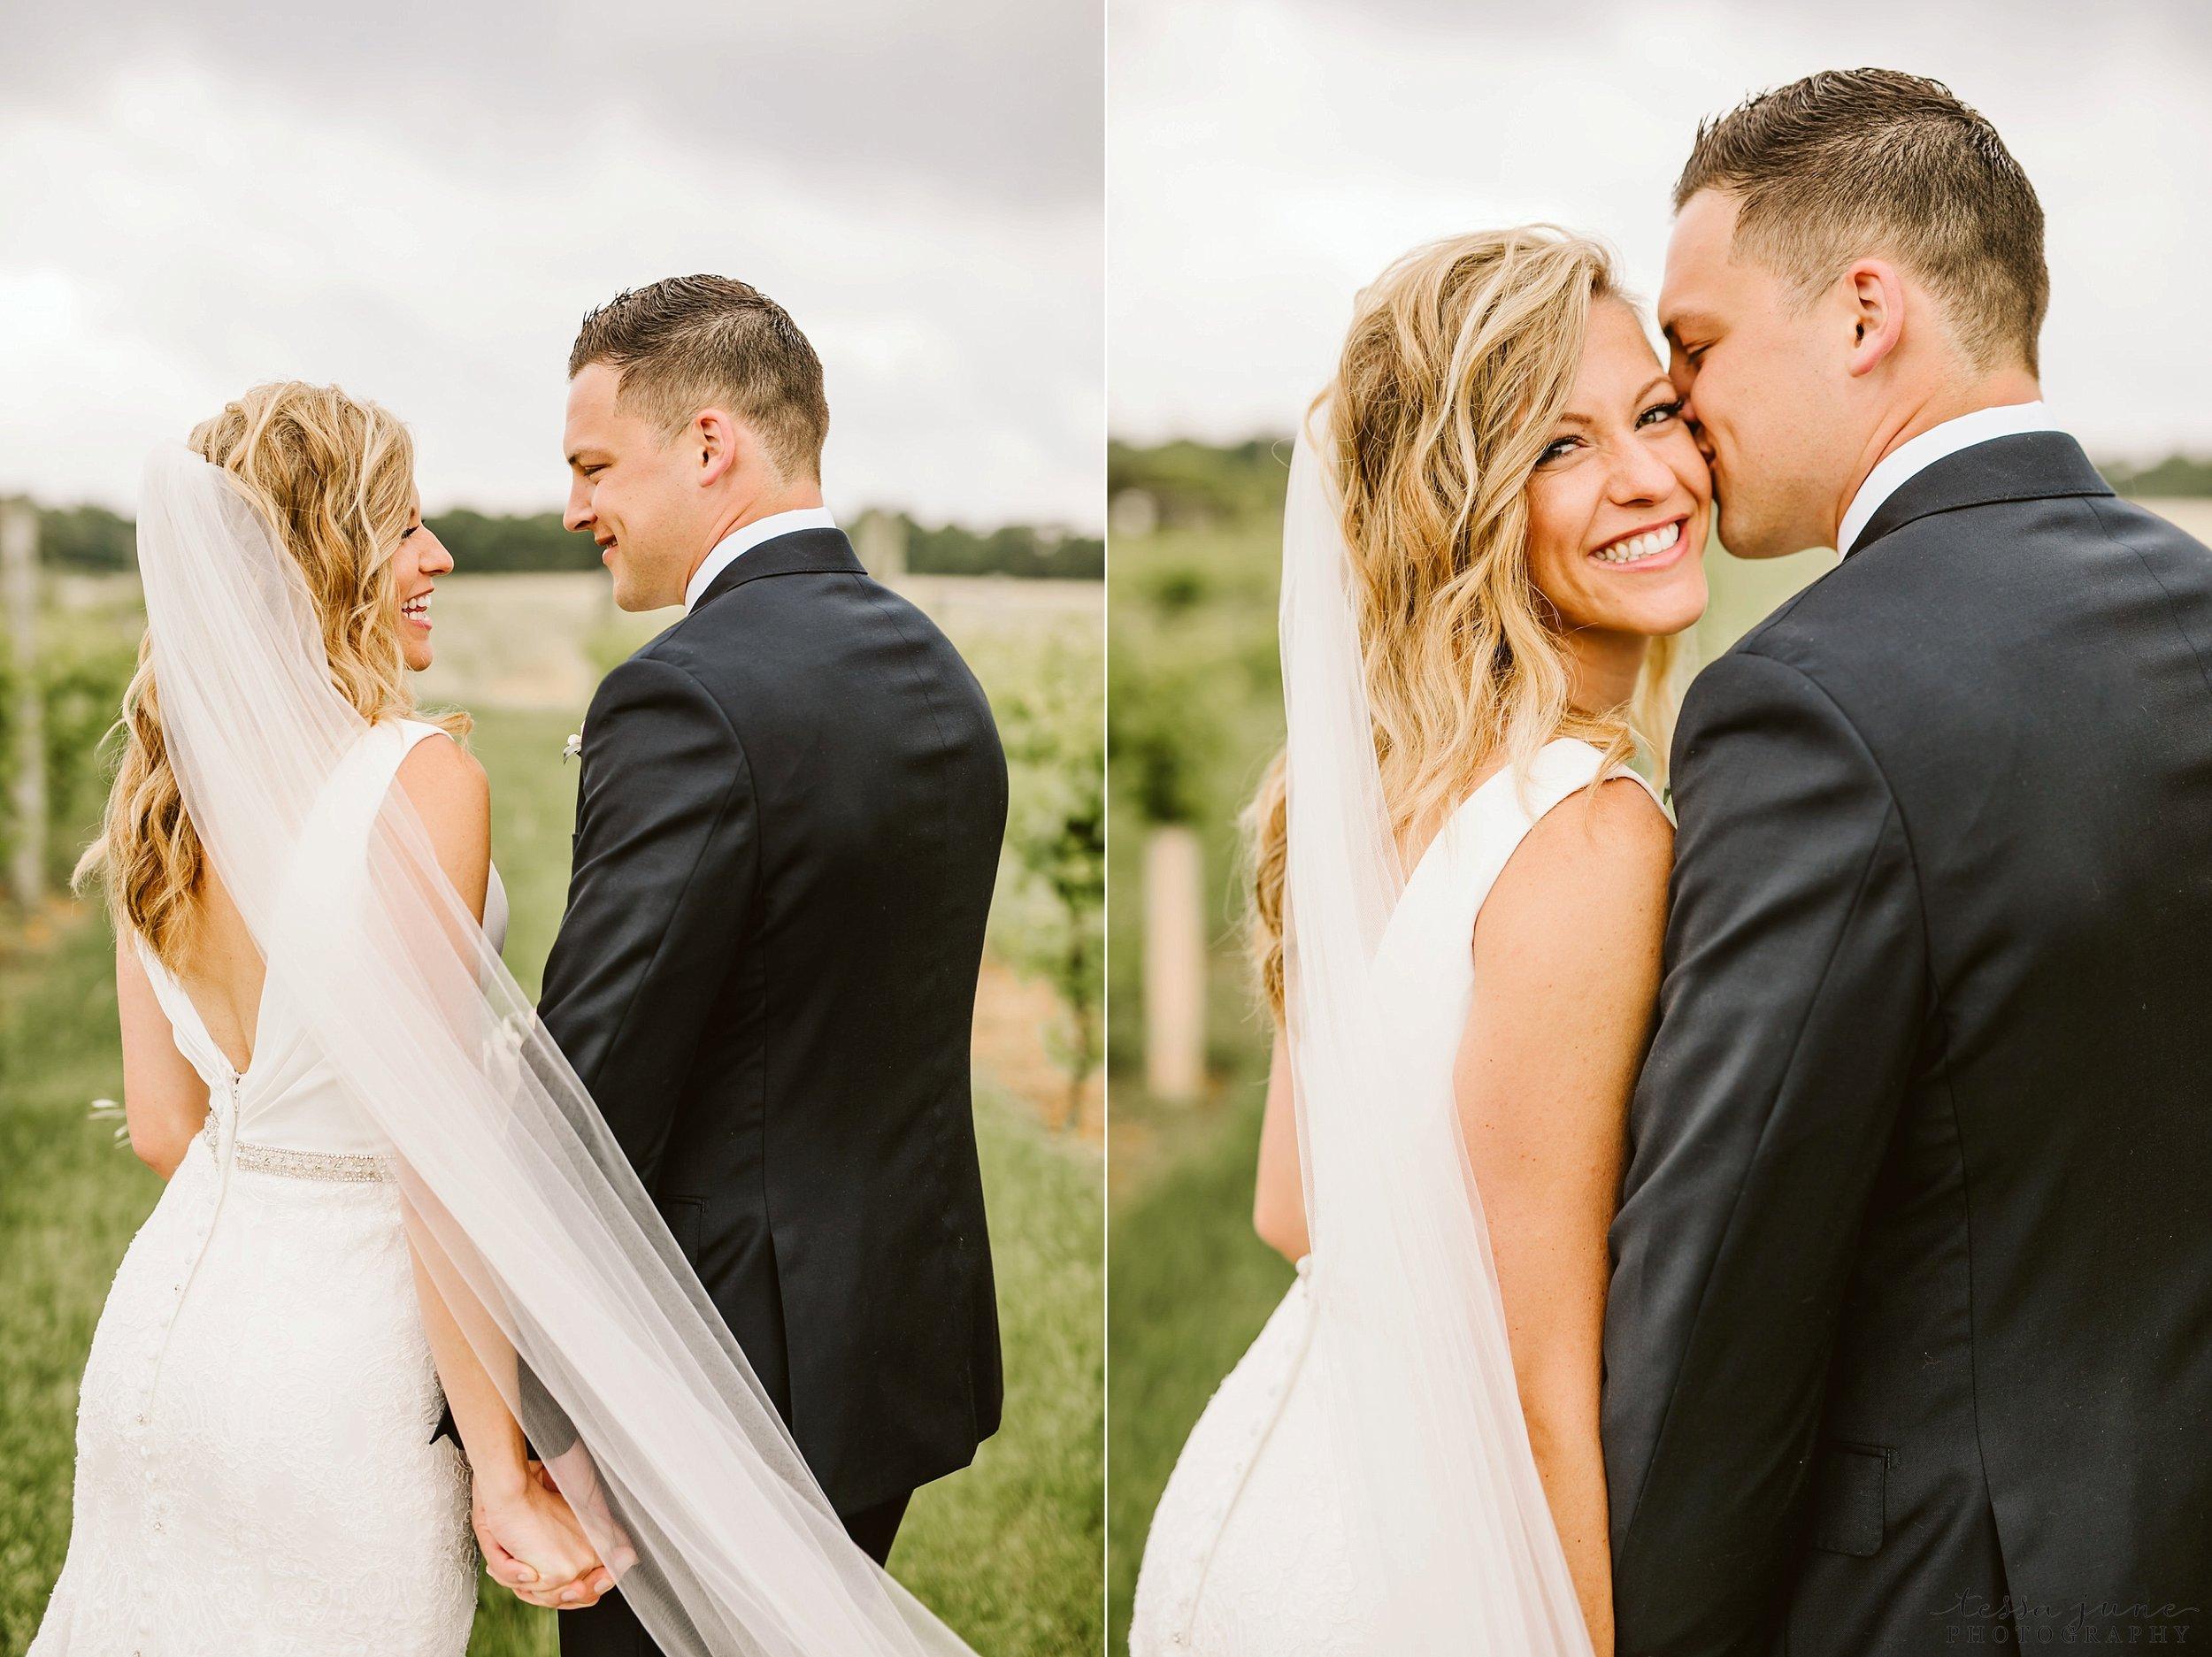 carlos-creek-winery-wedding-summer-pristine-floral-blush-pink-navy-alexandria-minnesota-59.jpg